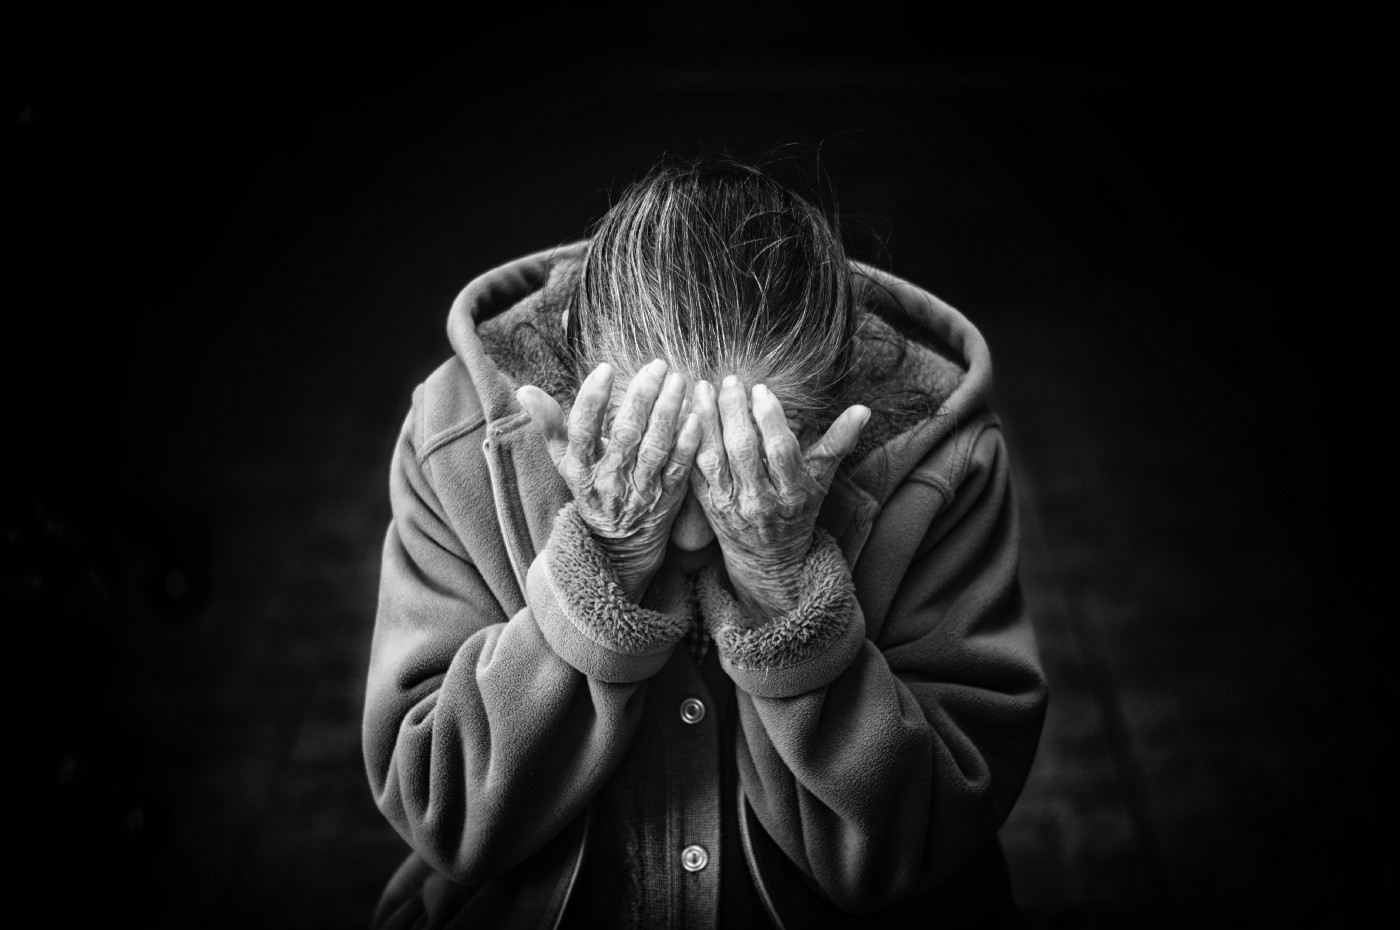 old lady in despair Cristian Newman on Unsplash.jpeg